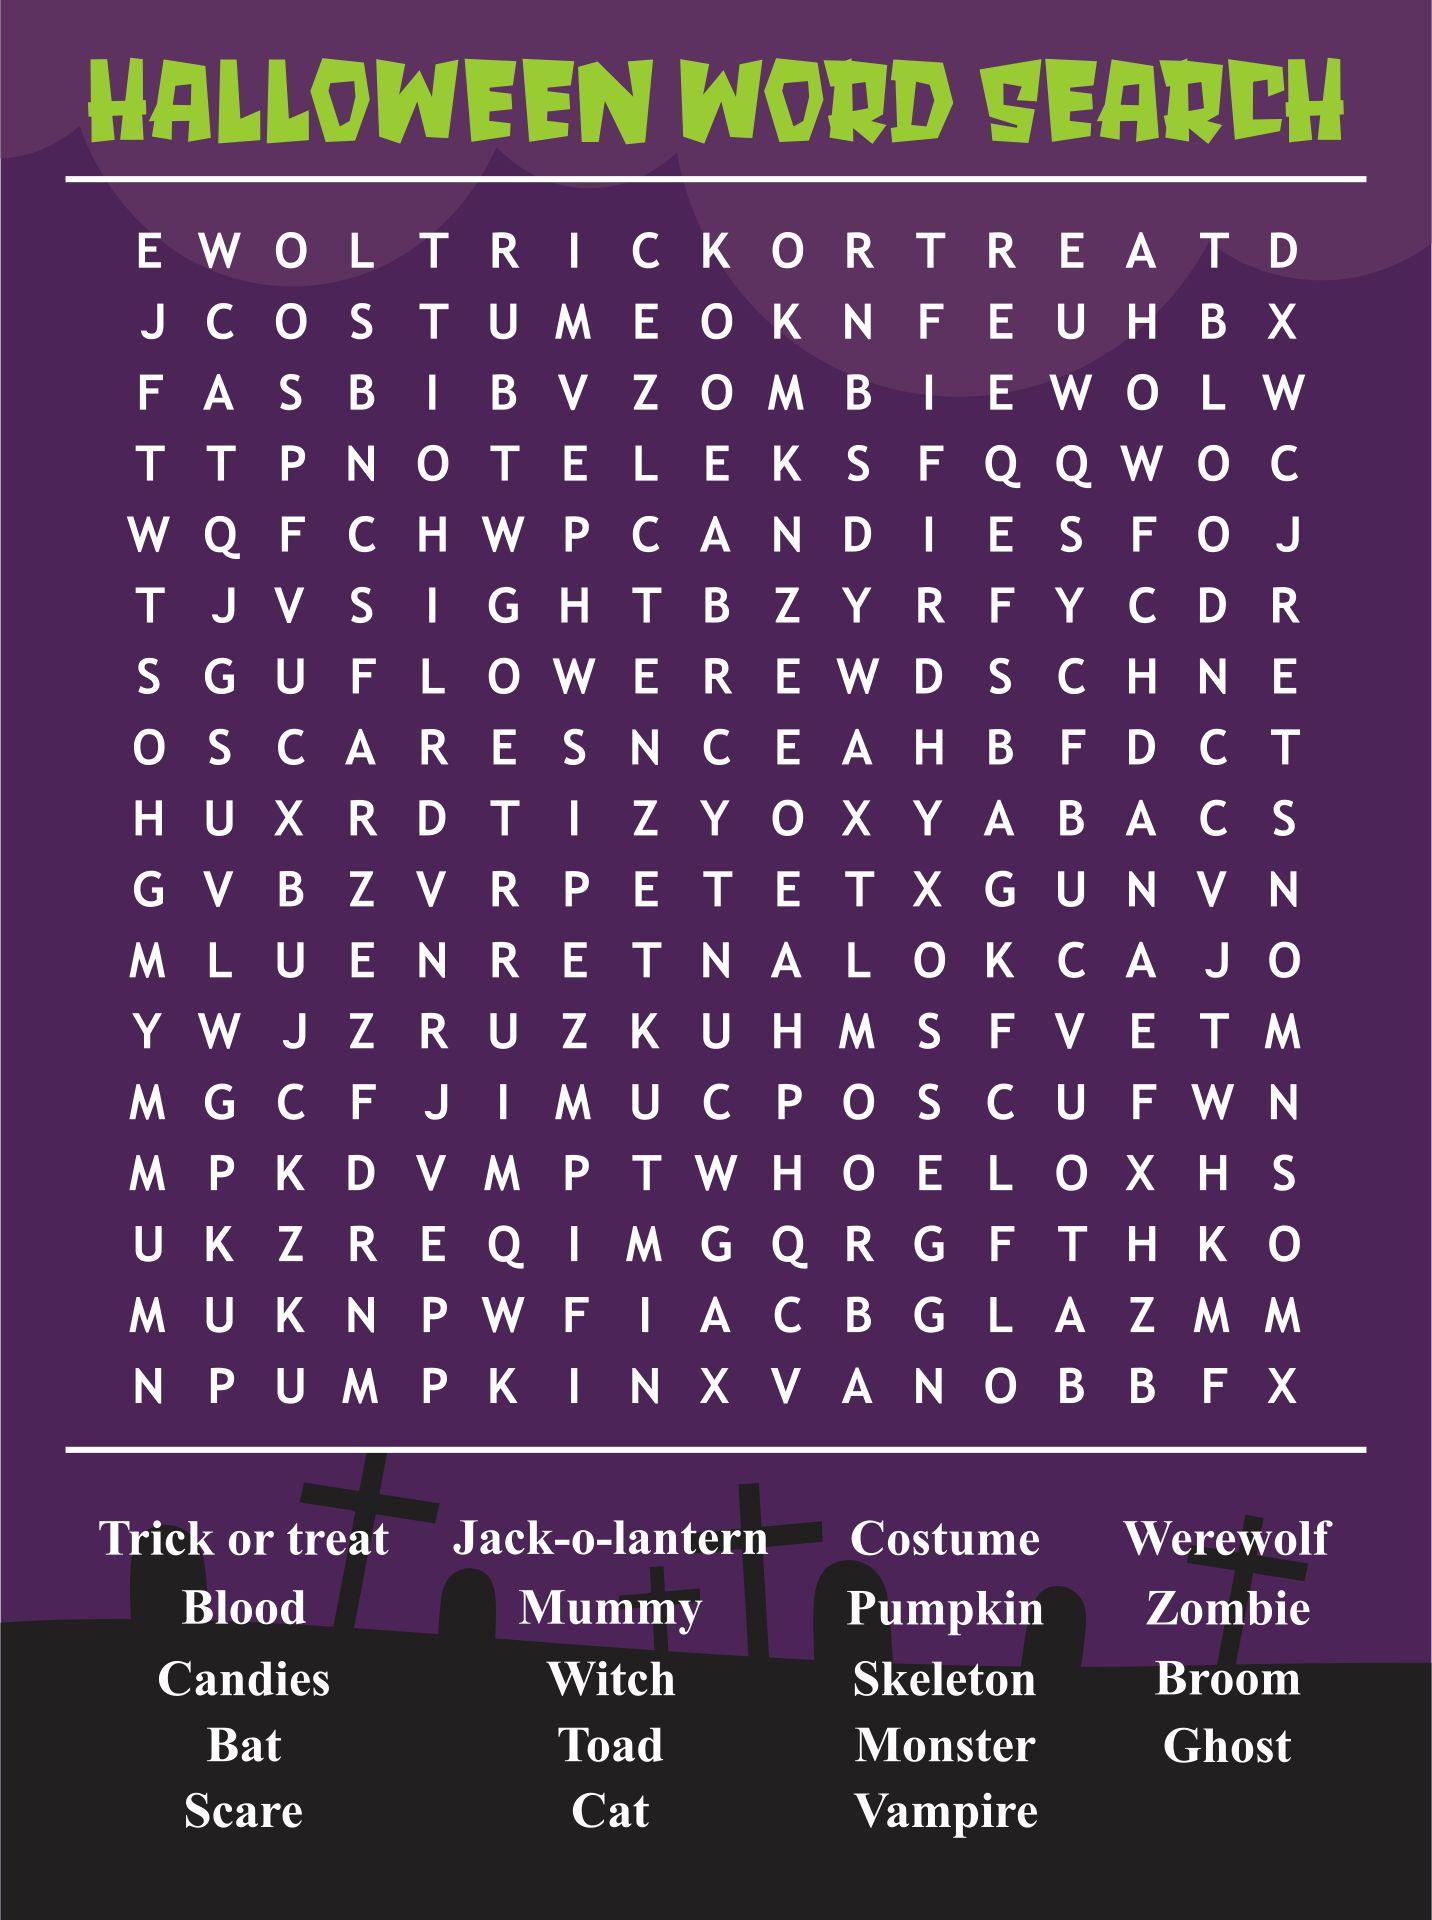 Free Halloween Word Search Printable For Kids